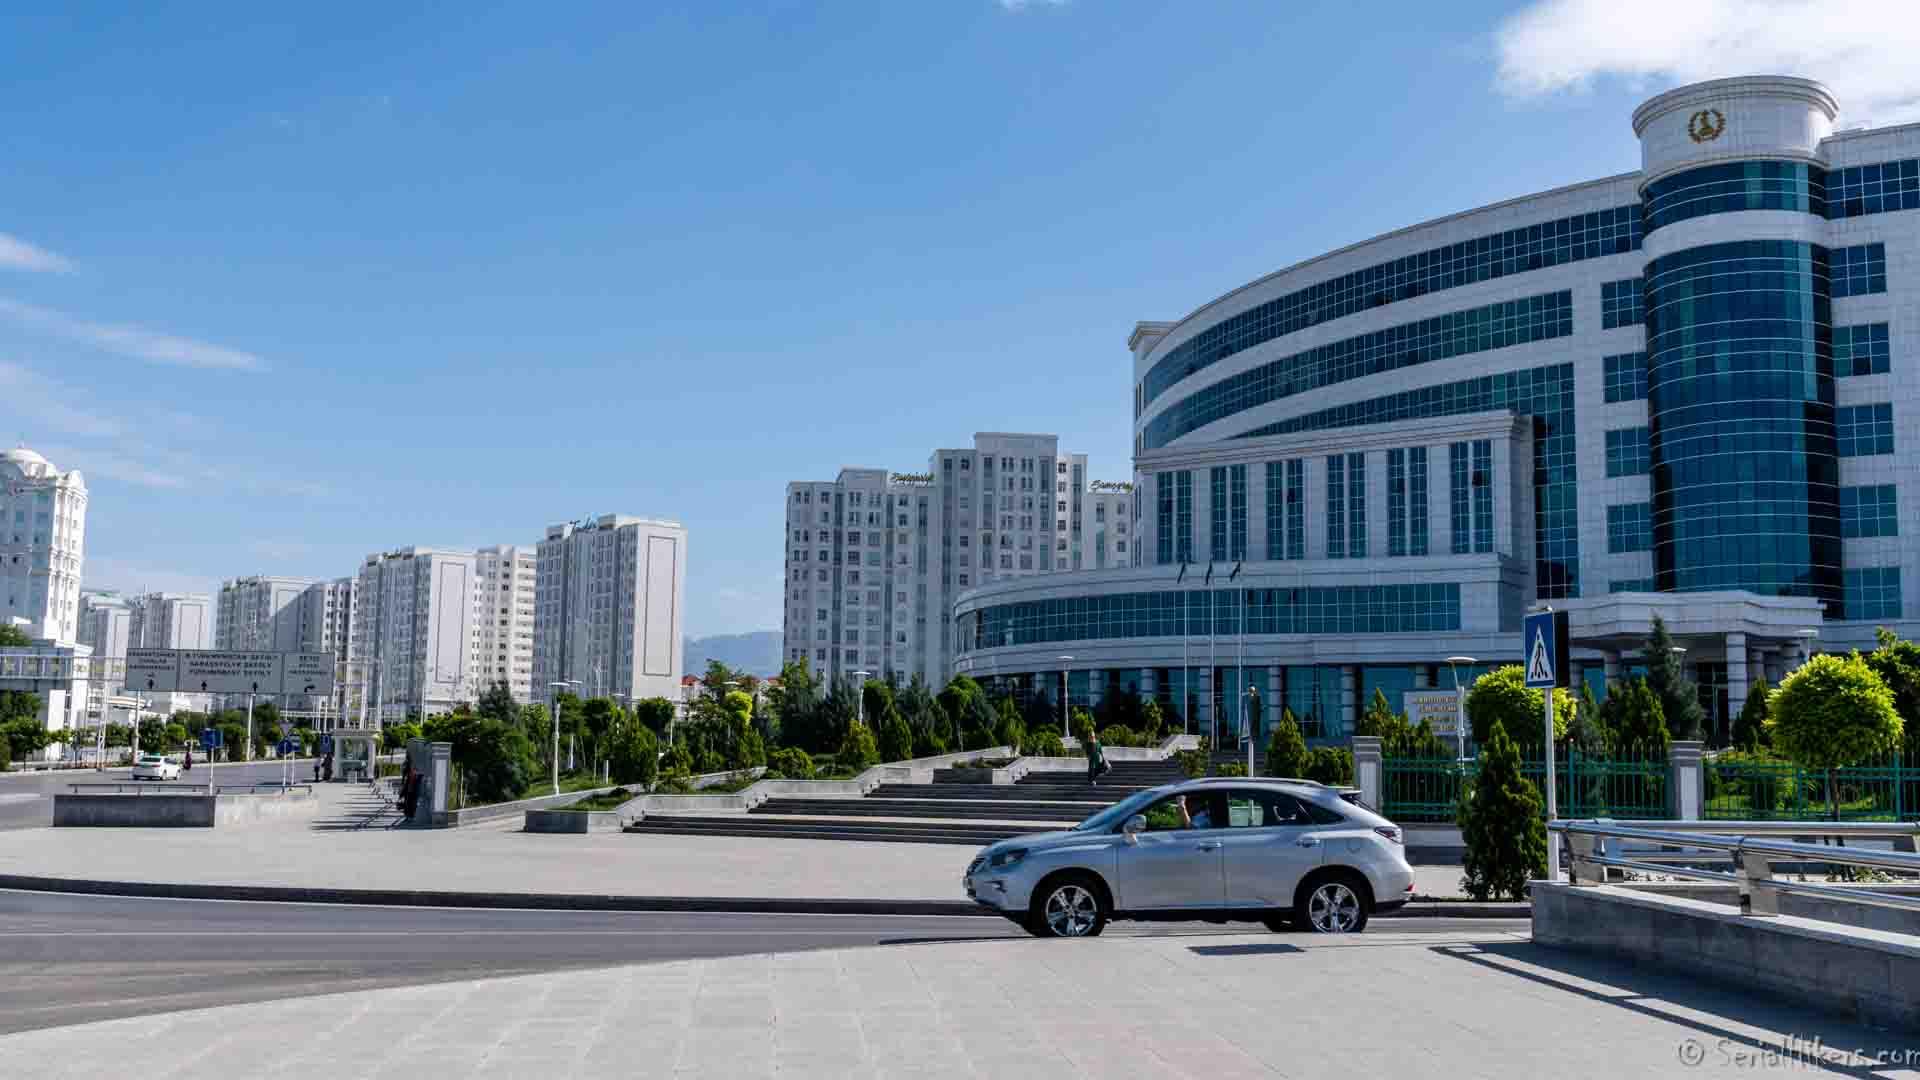 SerialHikers stop autostop world monde tour hitchhiking aventure adventure alternative travel voyage sans avion no fly achgabat ashgabat turkmenistan